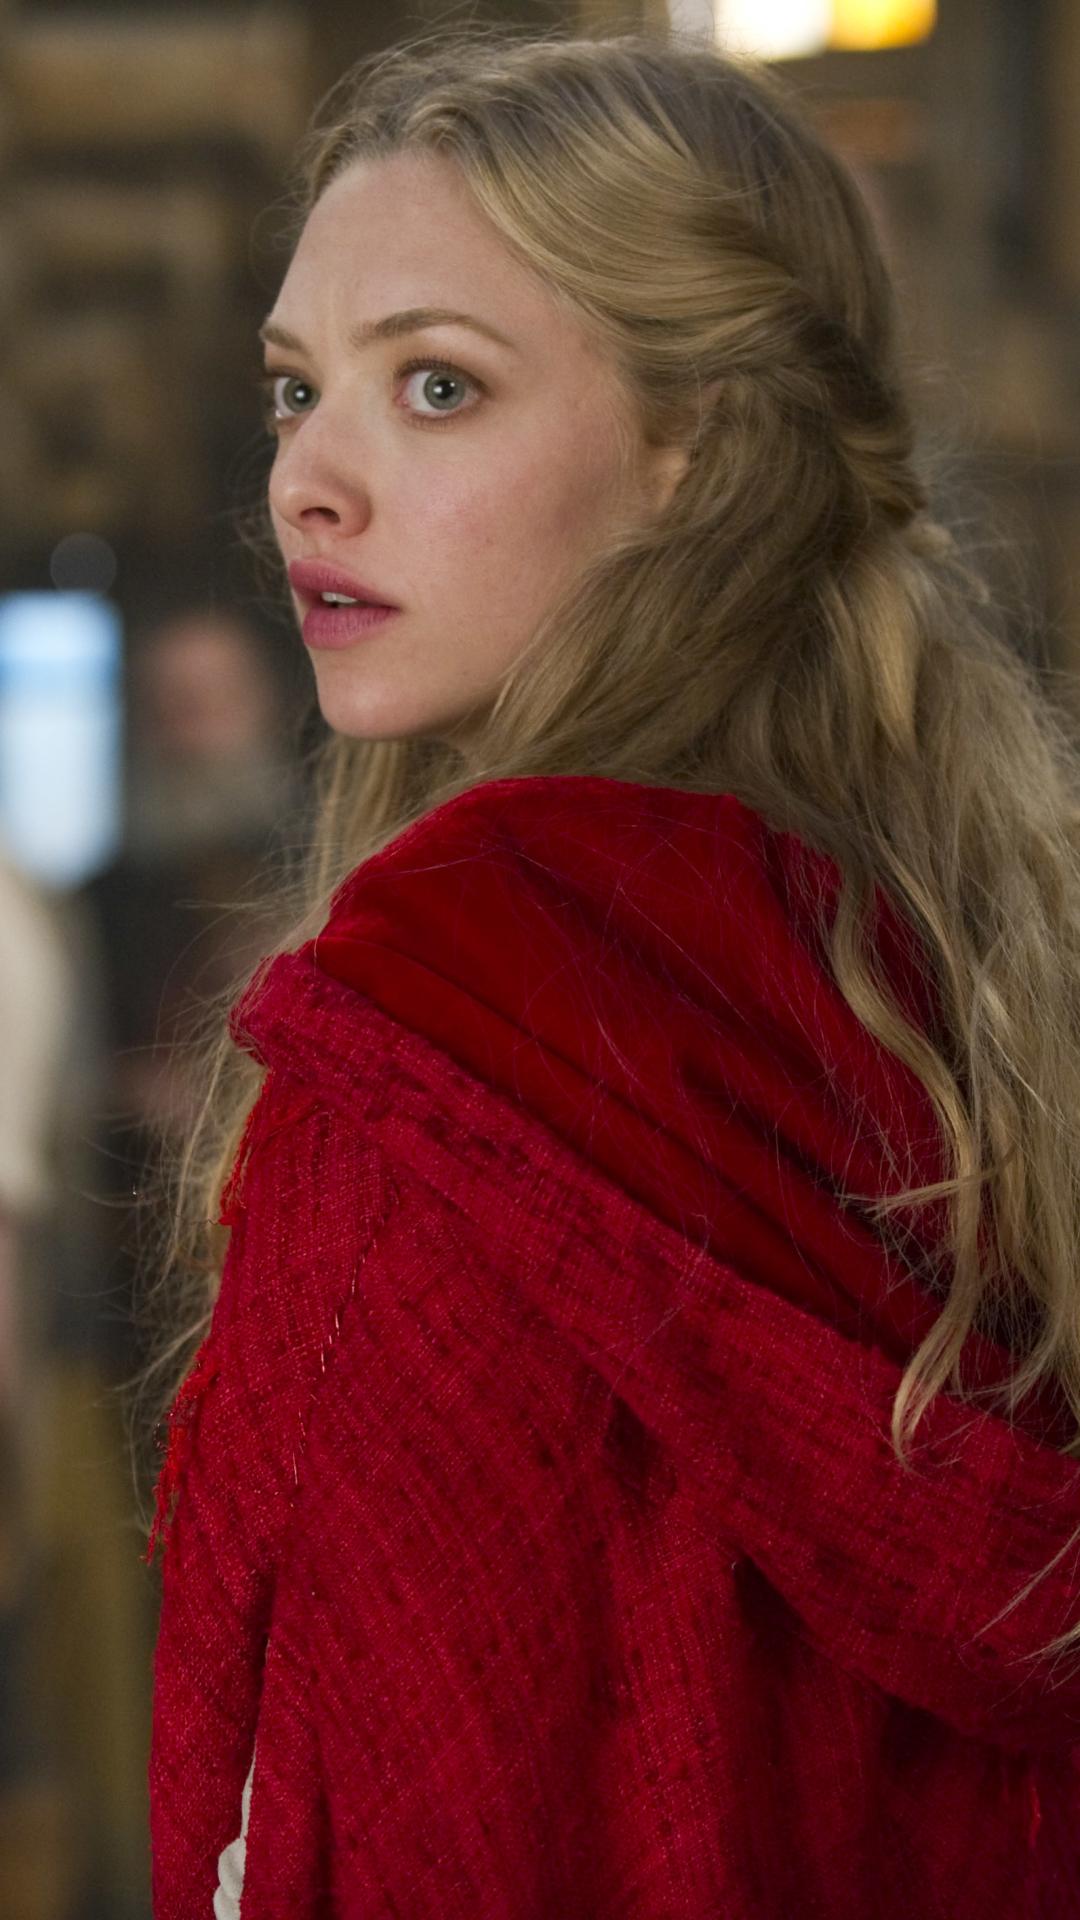 iPhone 7 Plus - Movie/Red Riding Hood - Wallpaper ID: 672306 Amanda Seyfried Website